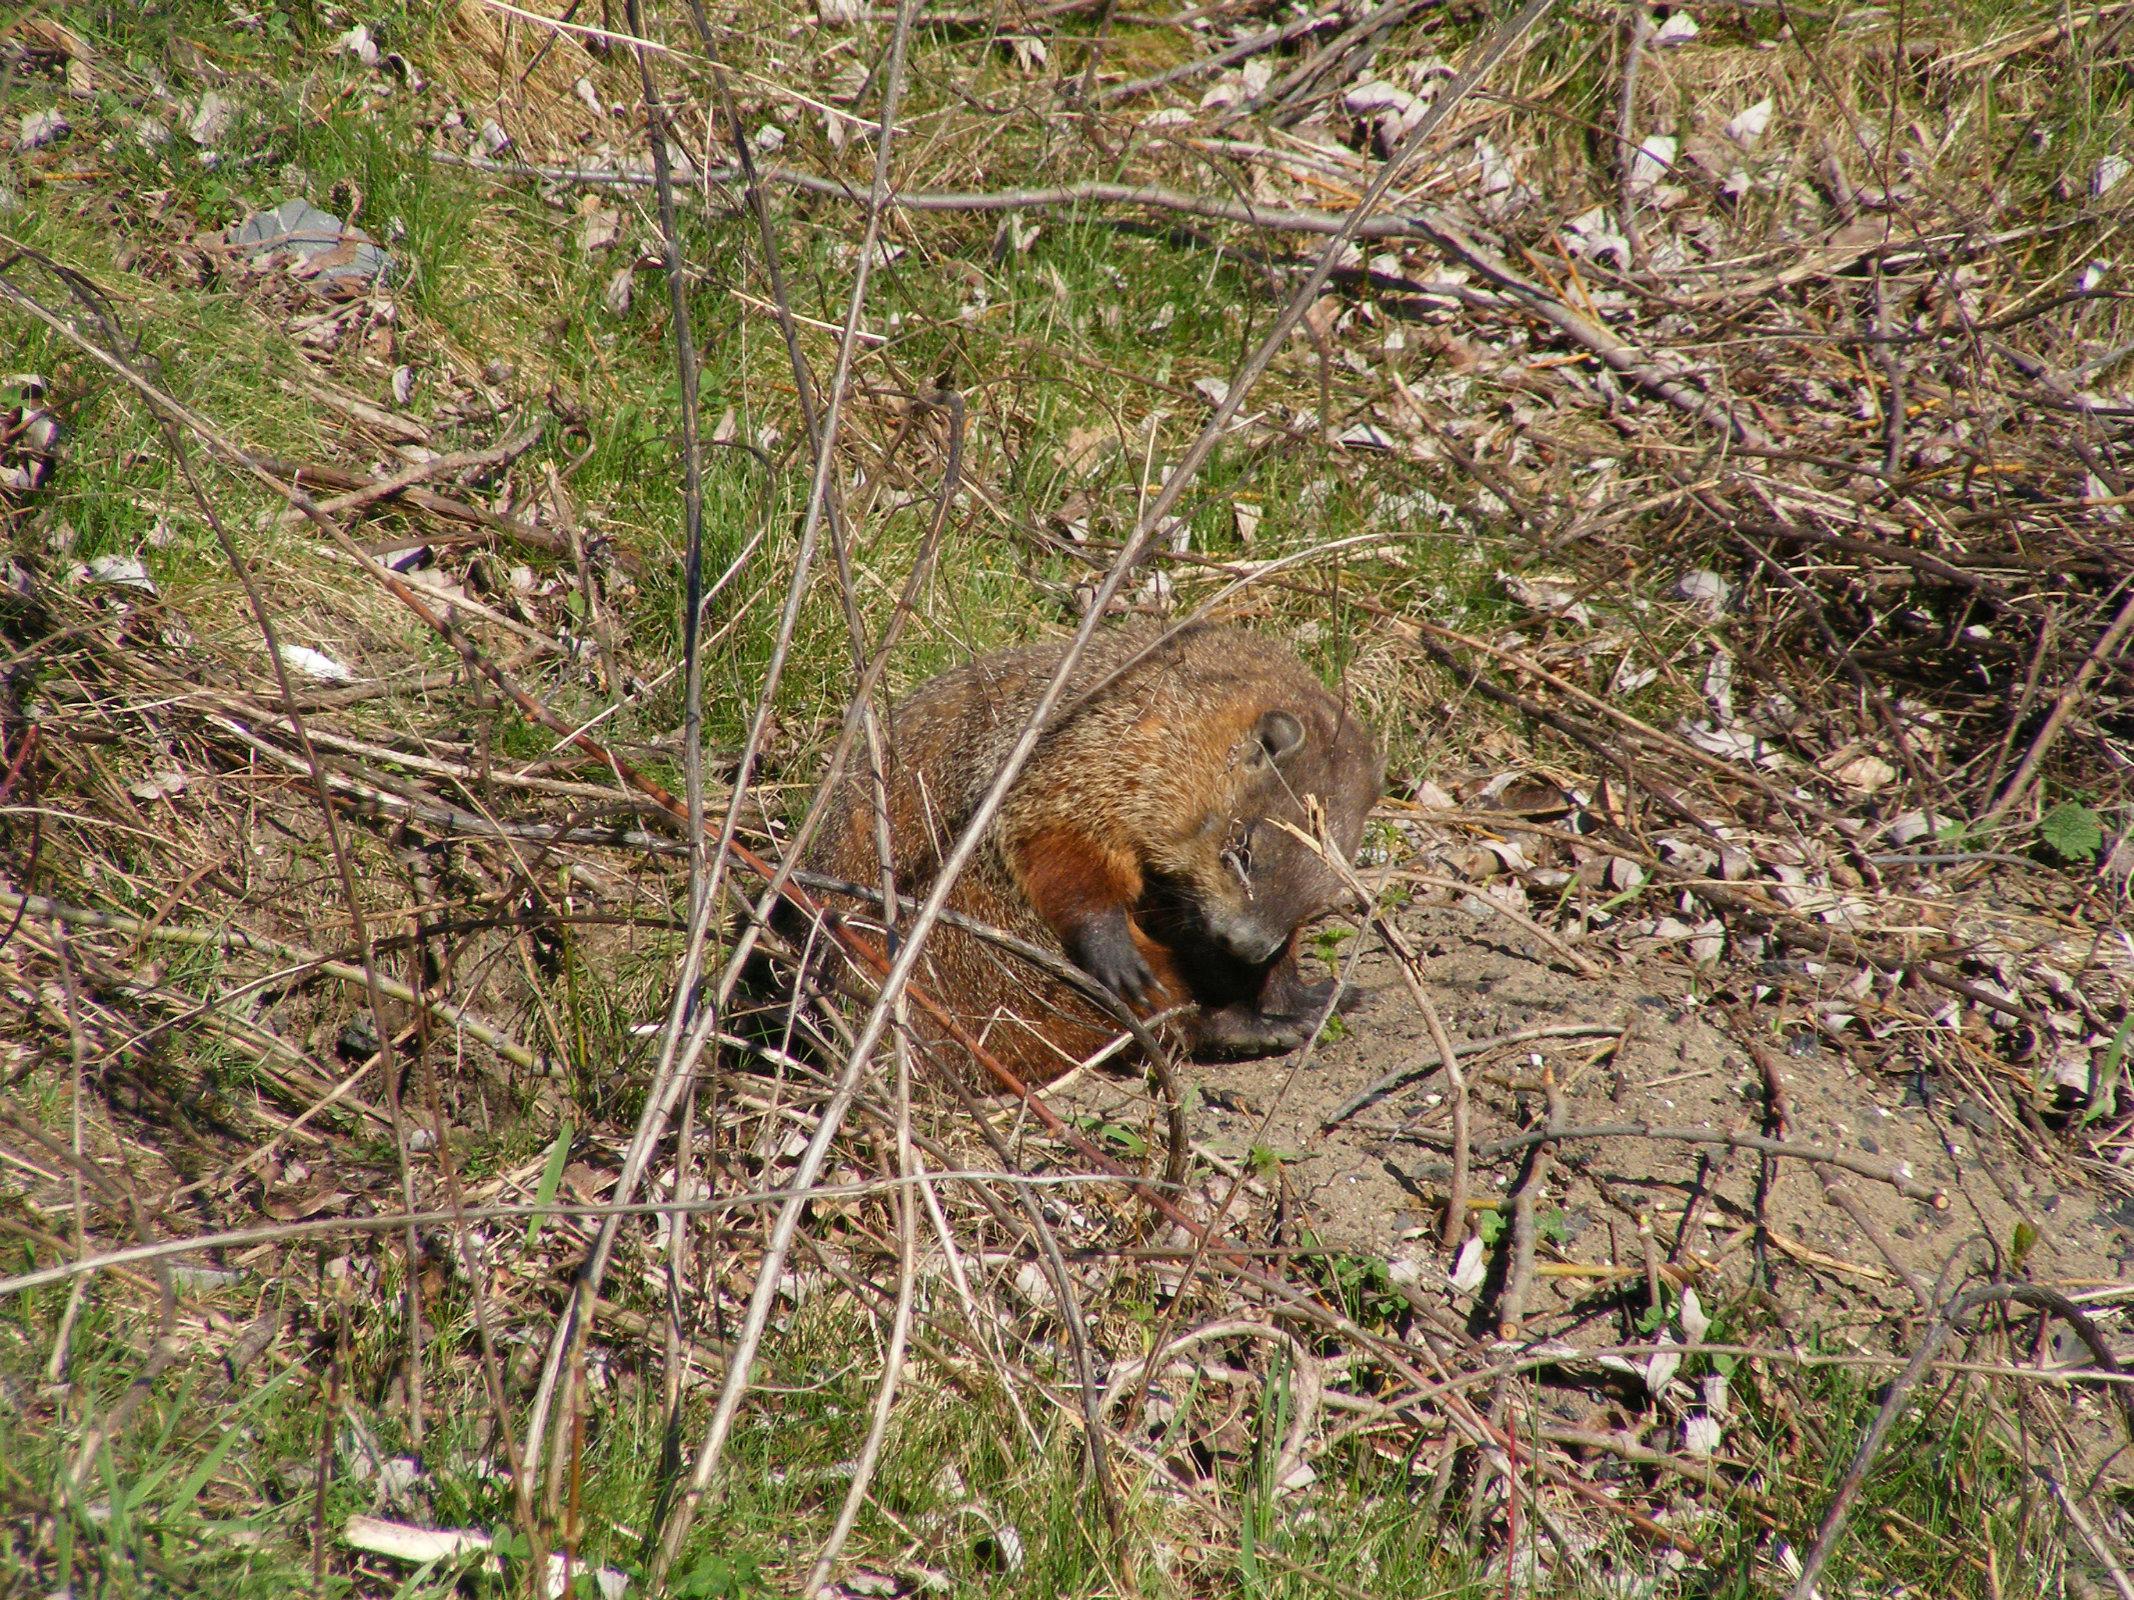 Groundhog 2016 scratch